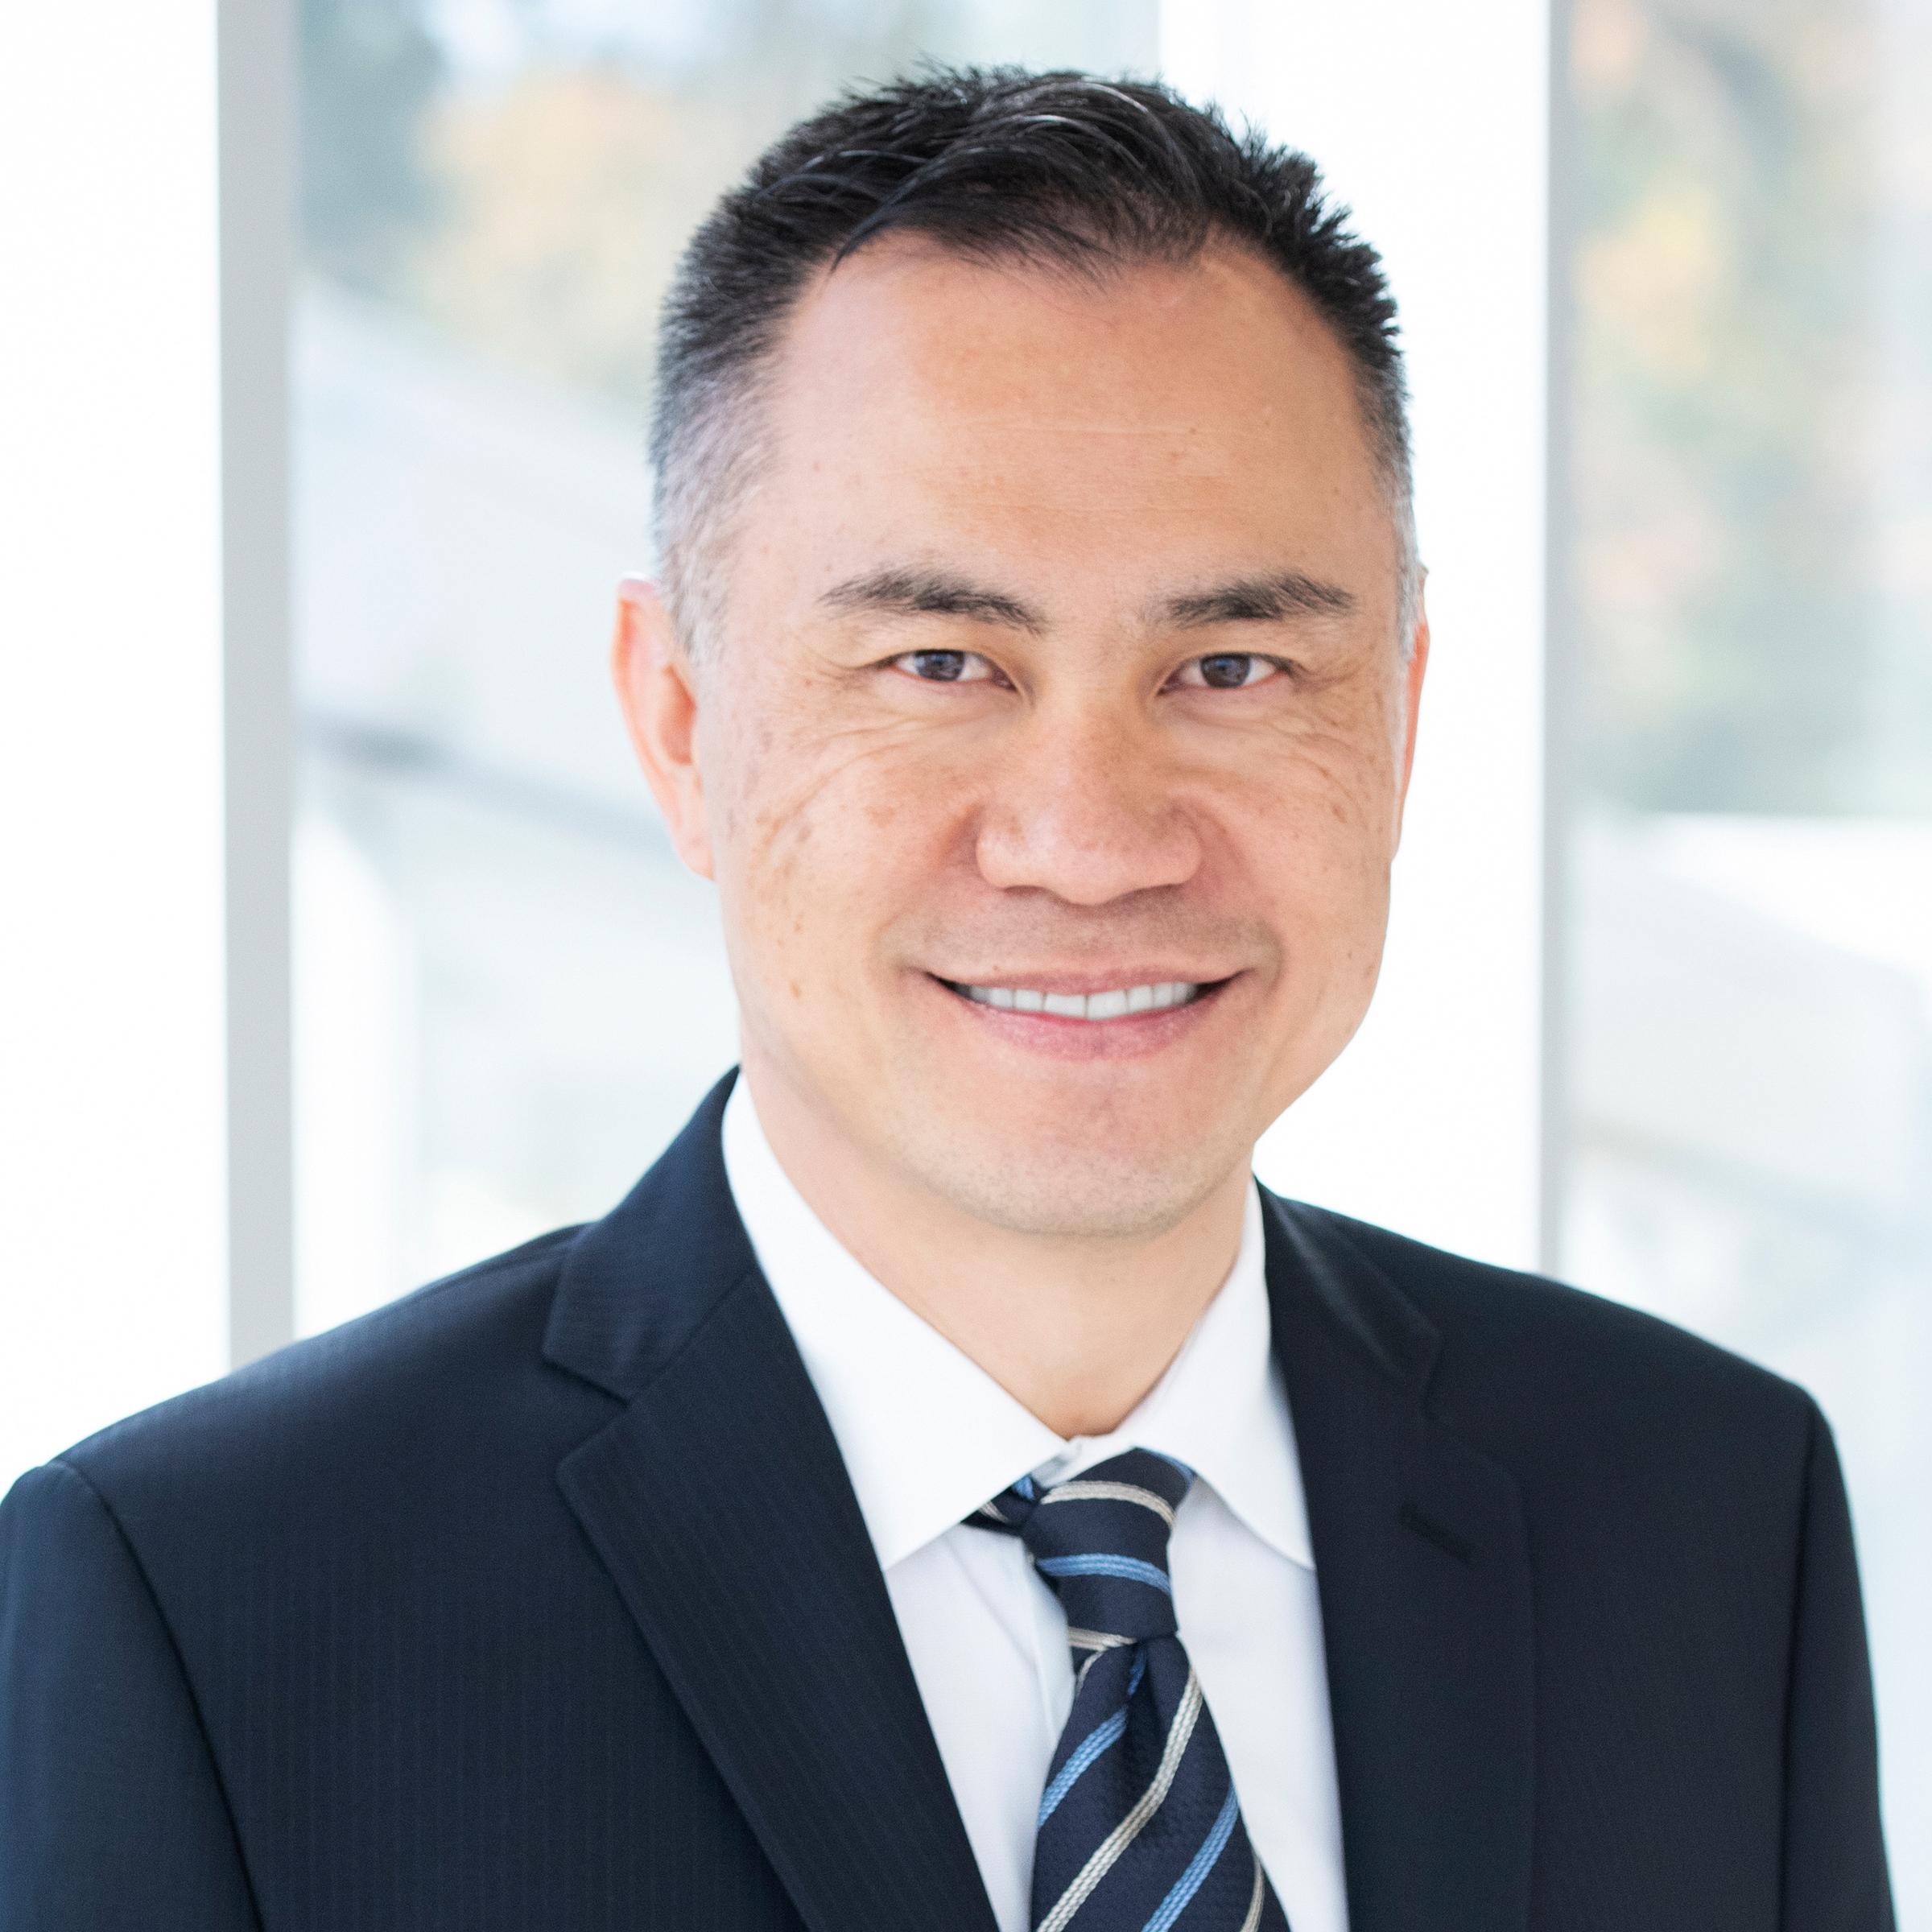 Dr. Choan E